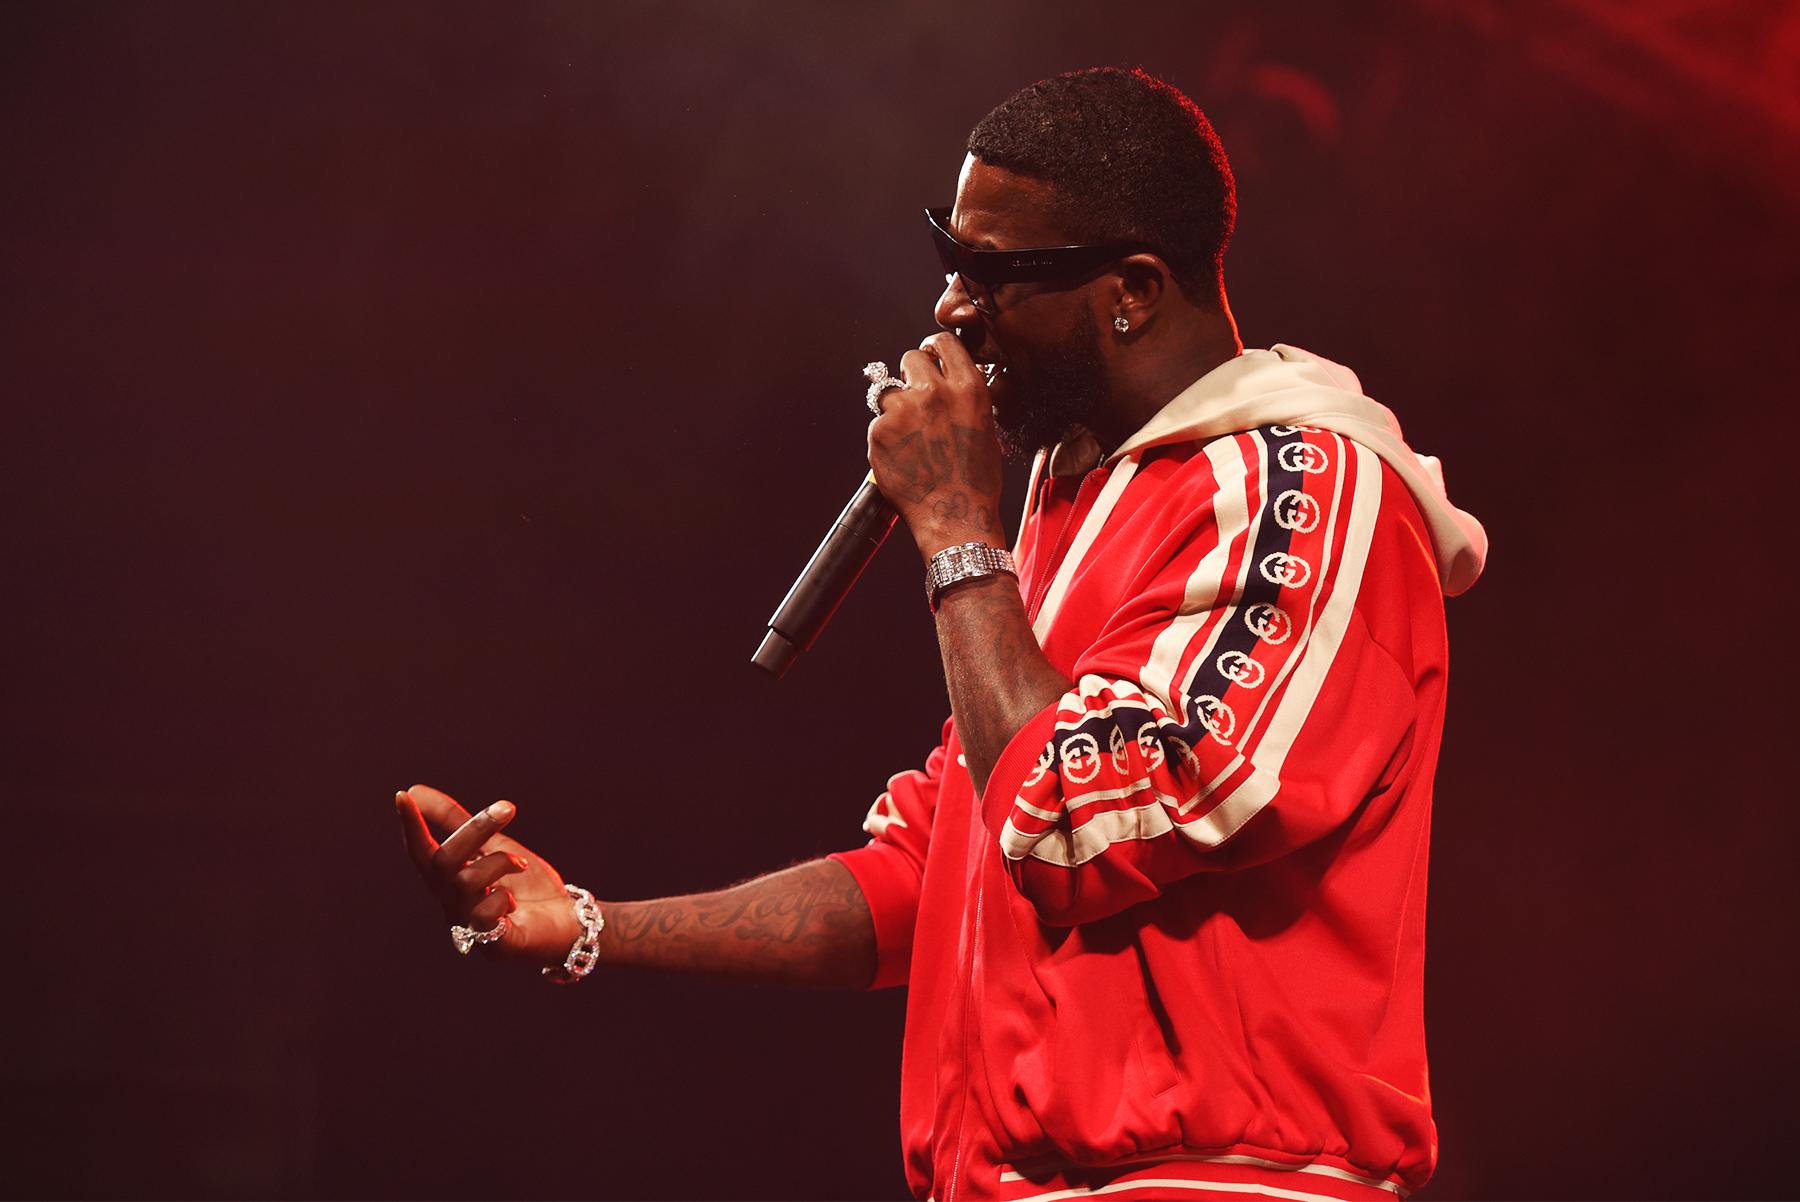 Gucci Mane_07web.jpg